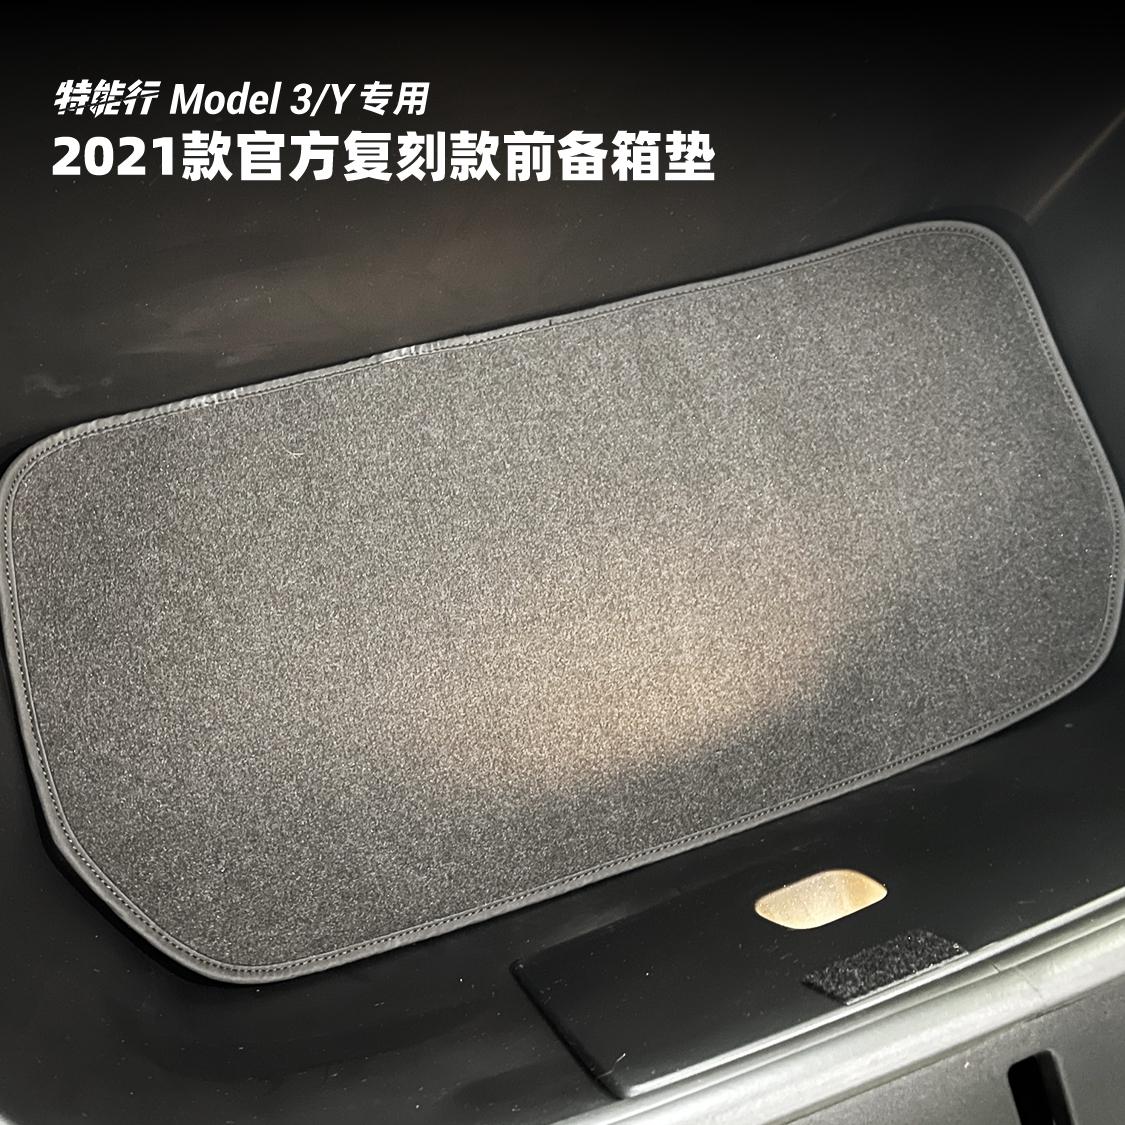 复刻原厂前备箱绒毛底垫适用于2021款Model 3/Y